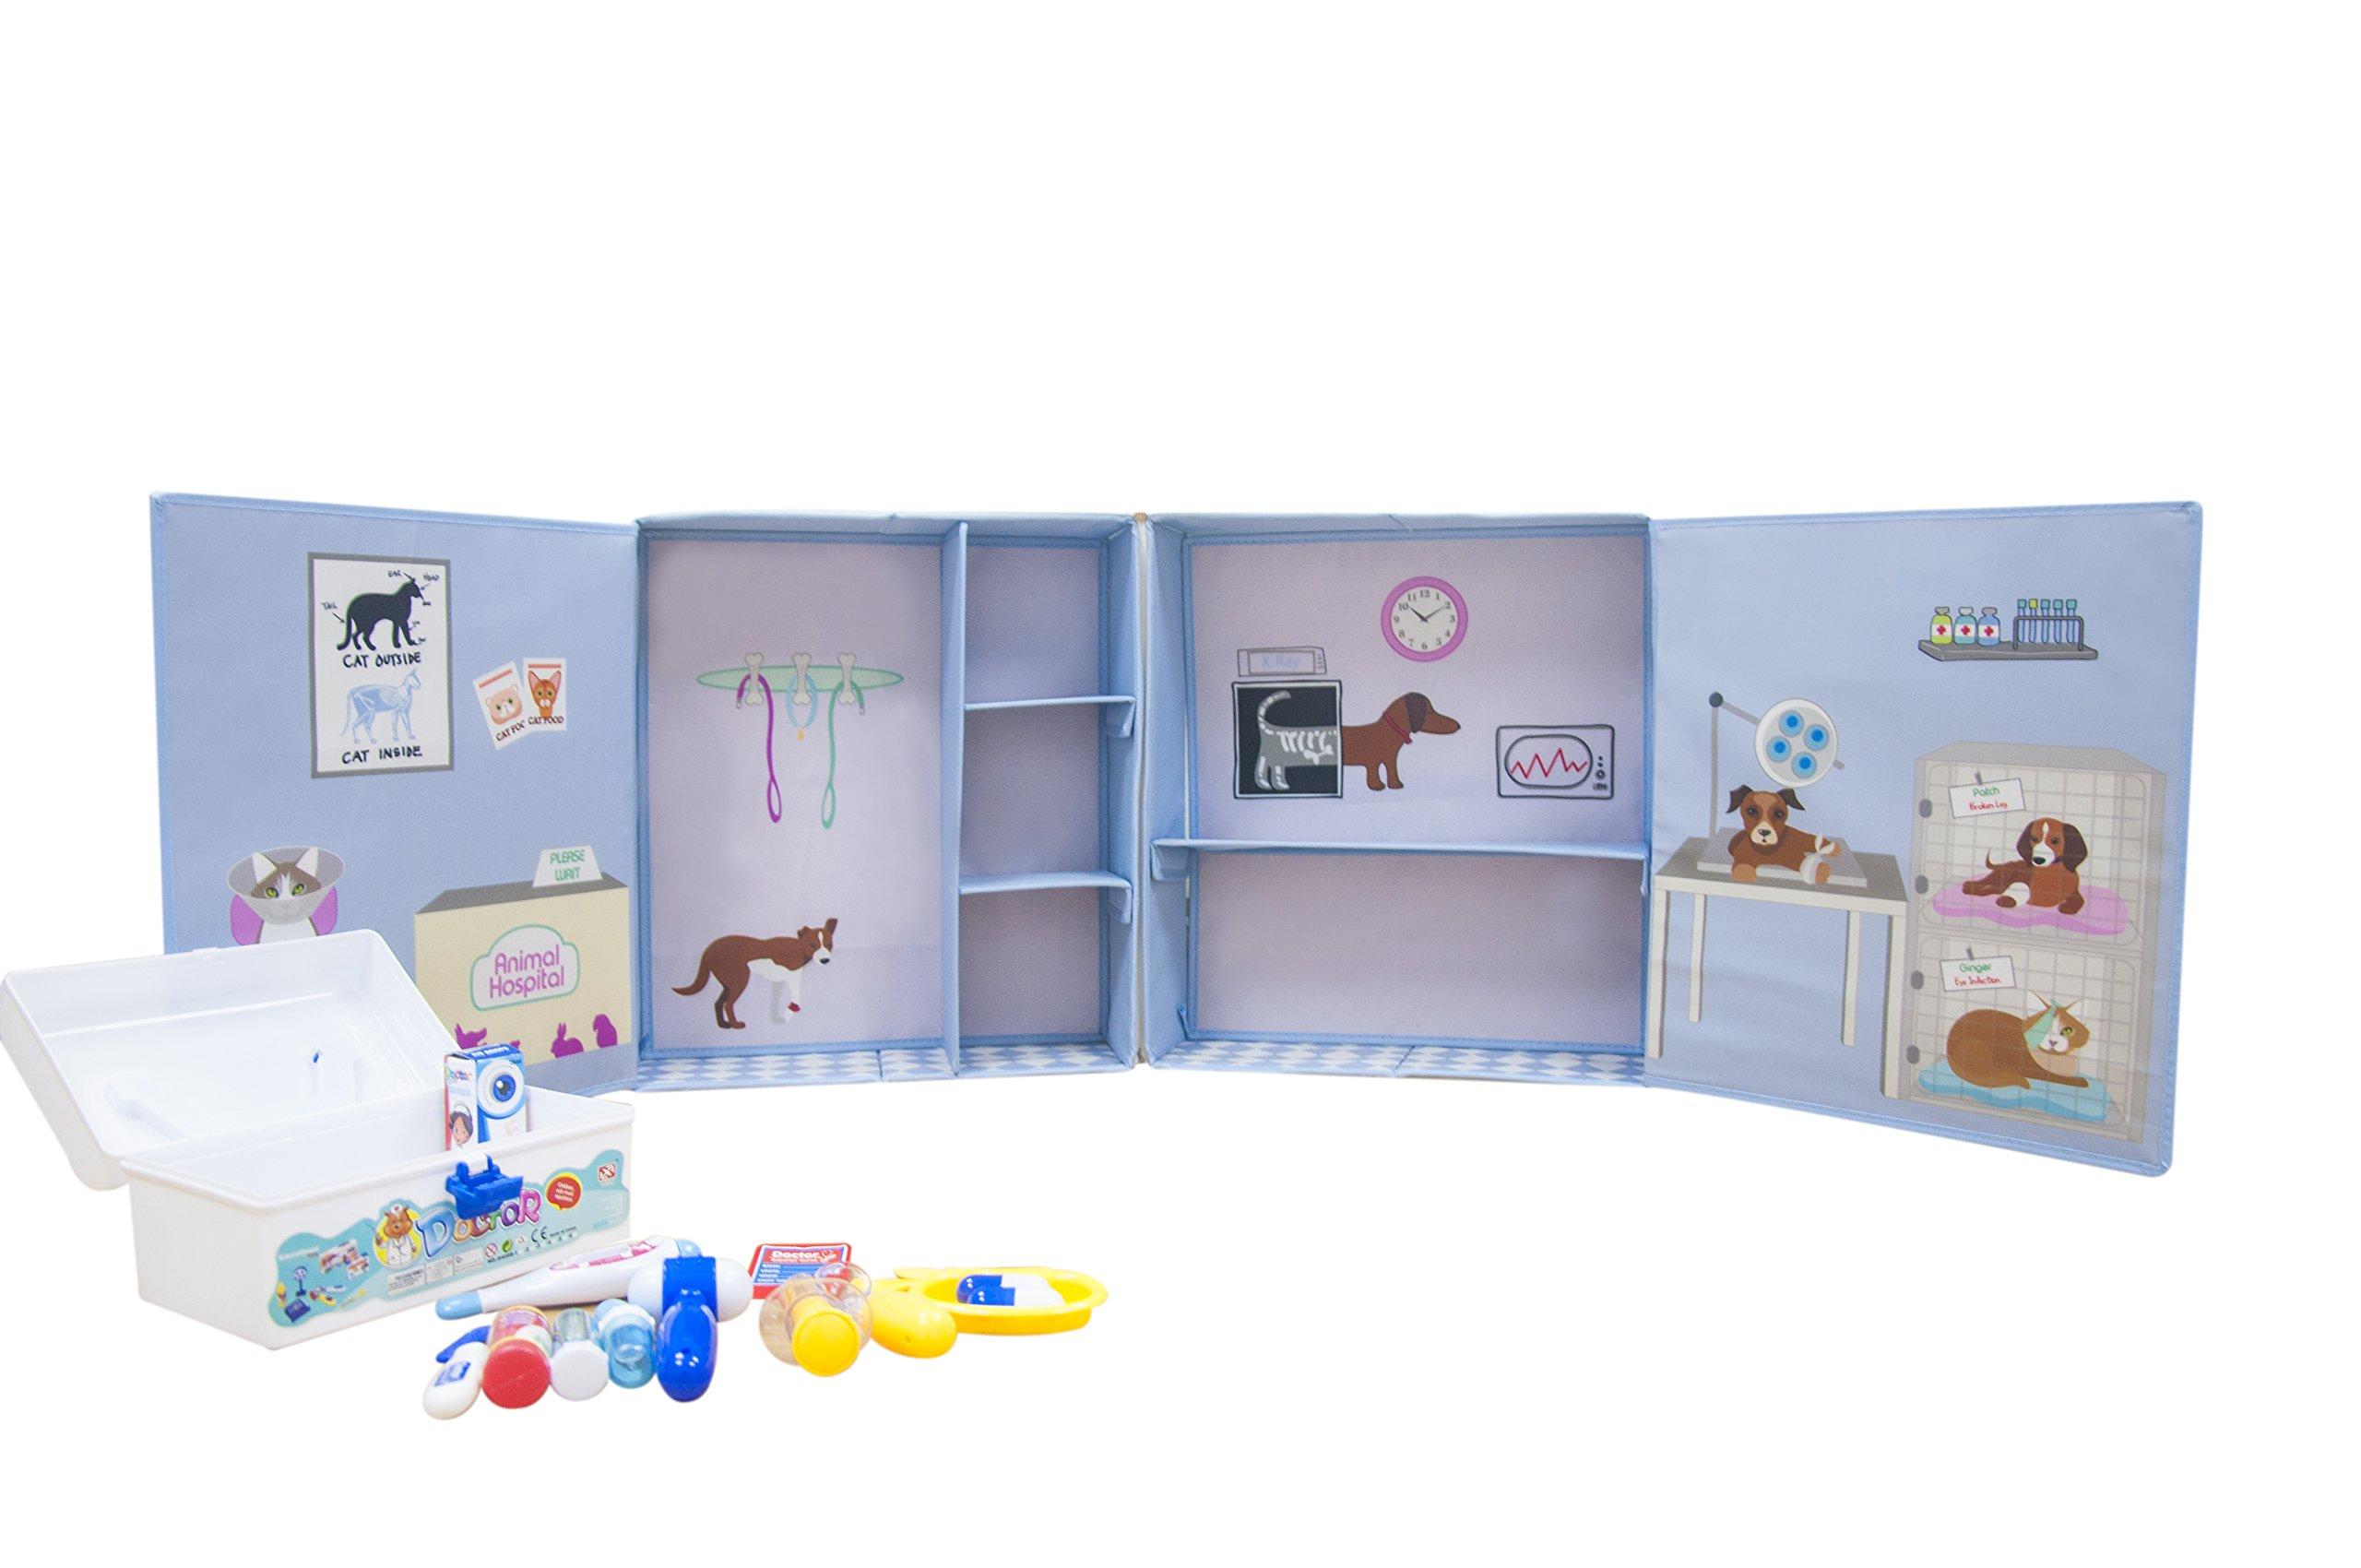 Asweets 10126001 Vet Animal Hospital with Plush Storage Box